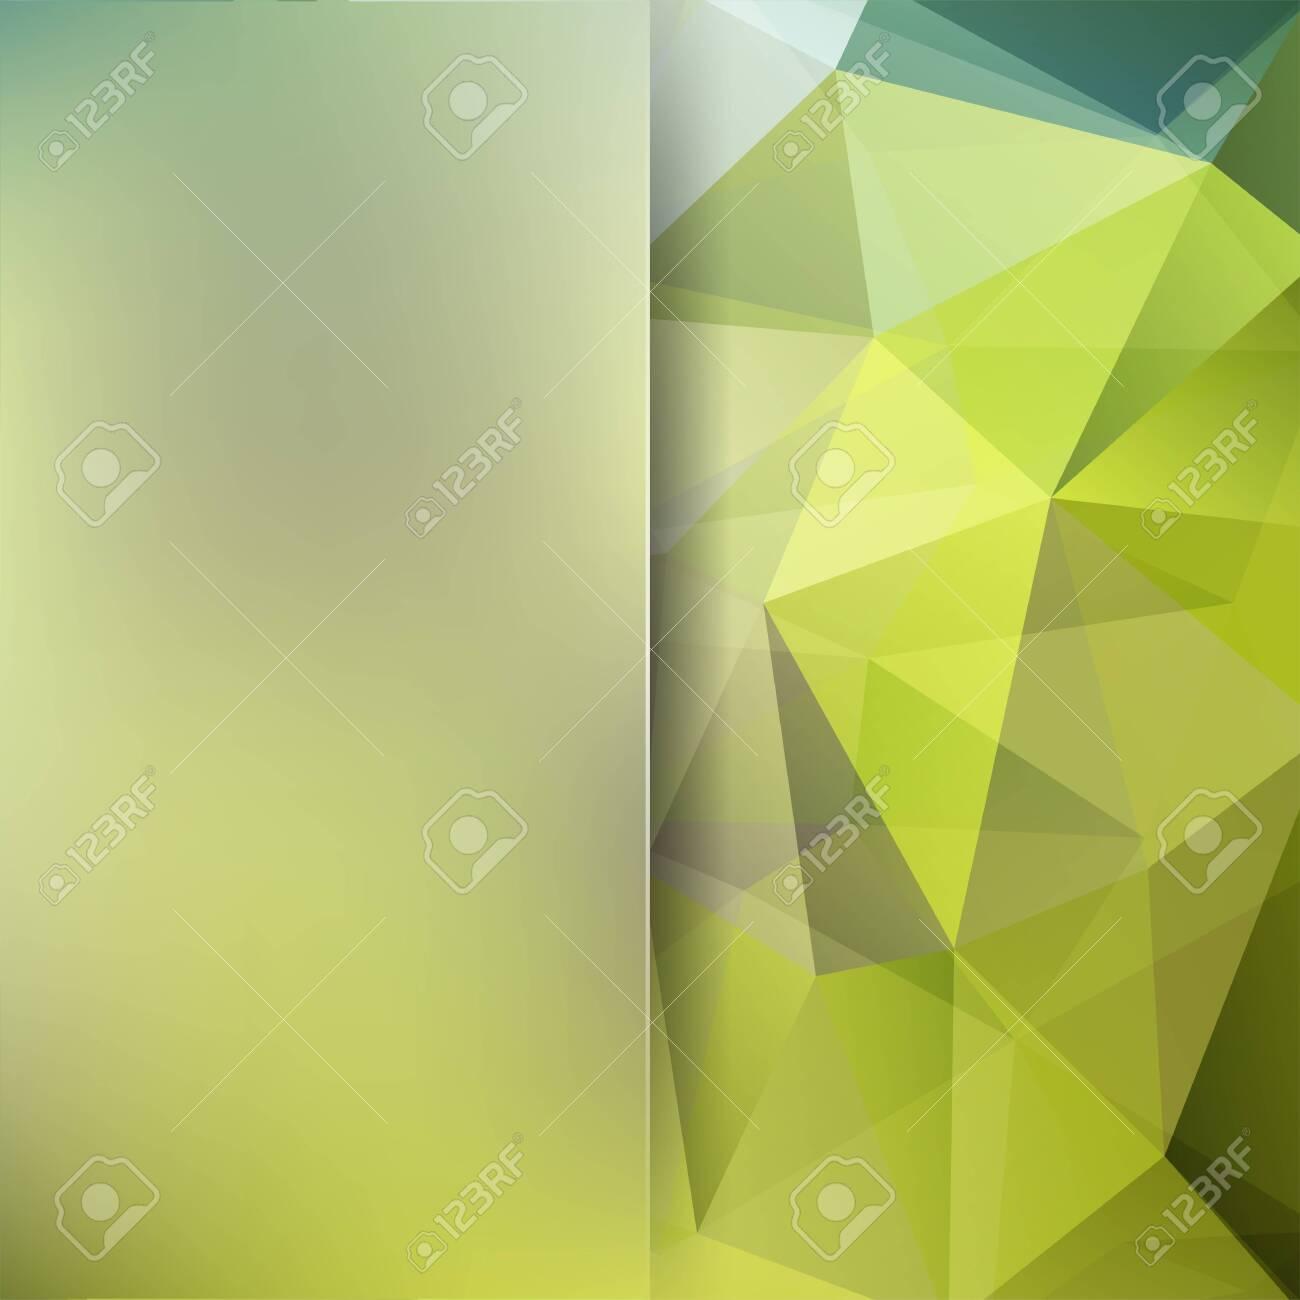 Abstract polygonal vector background. Green geometric vector illustration. Creative design template. Abstract vector background for use in design - 121991378